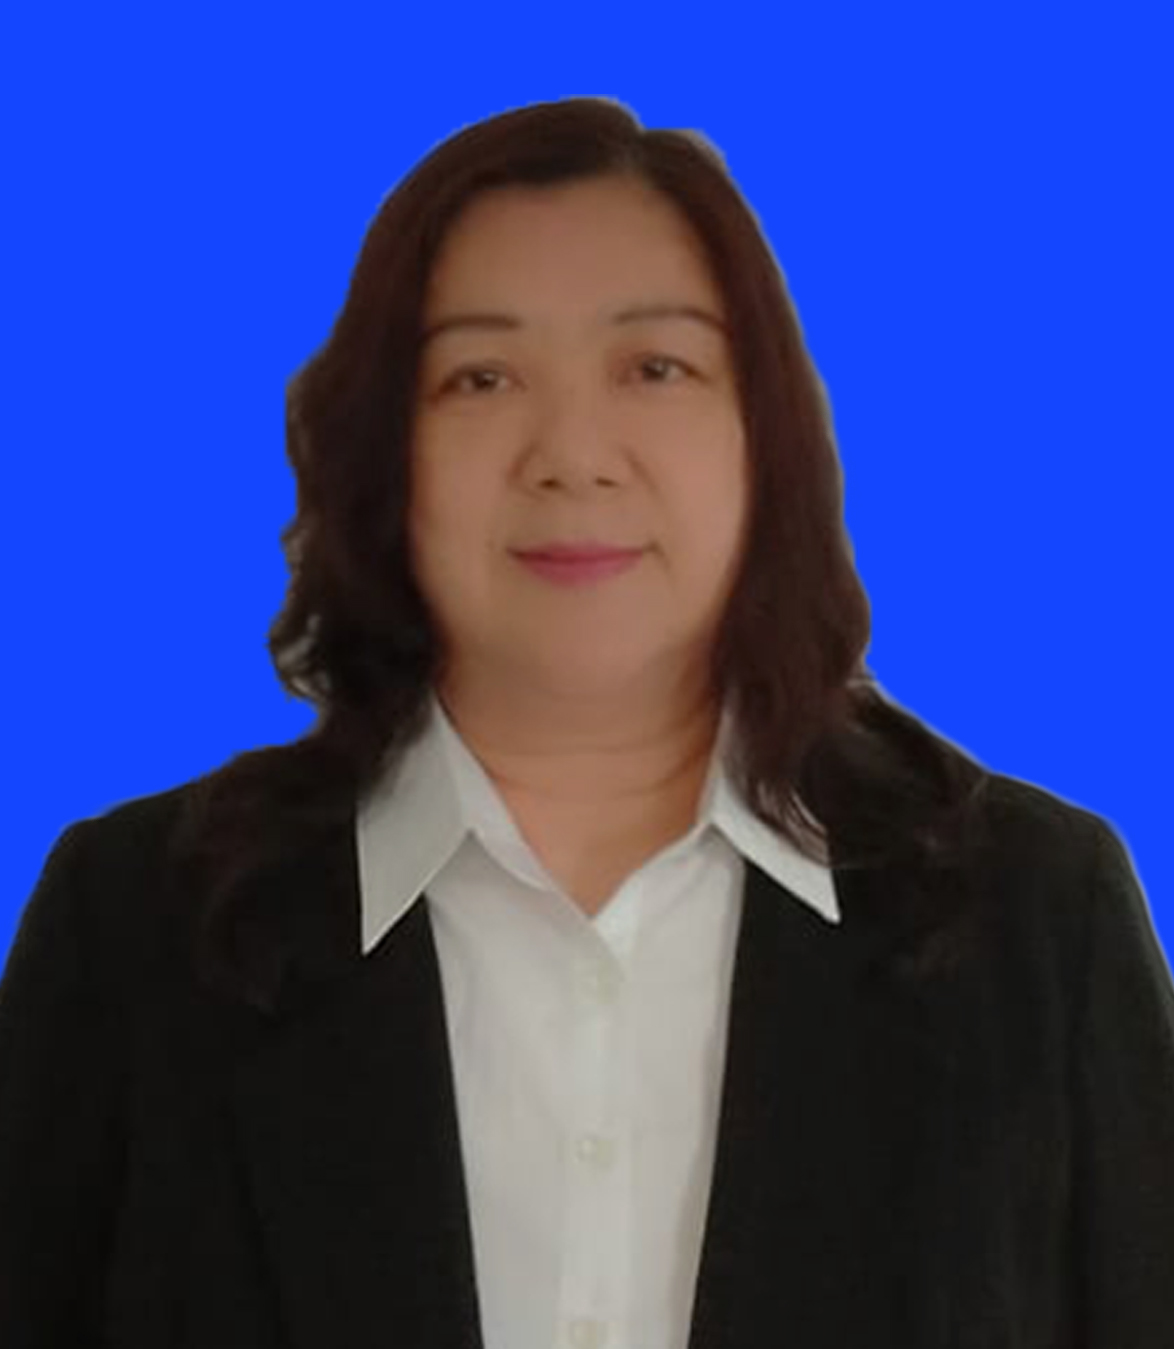 Tan Lie Tjoe